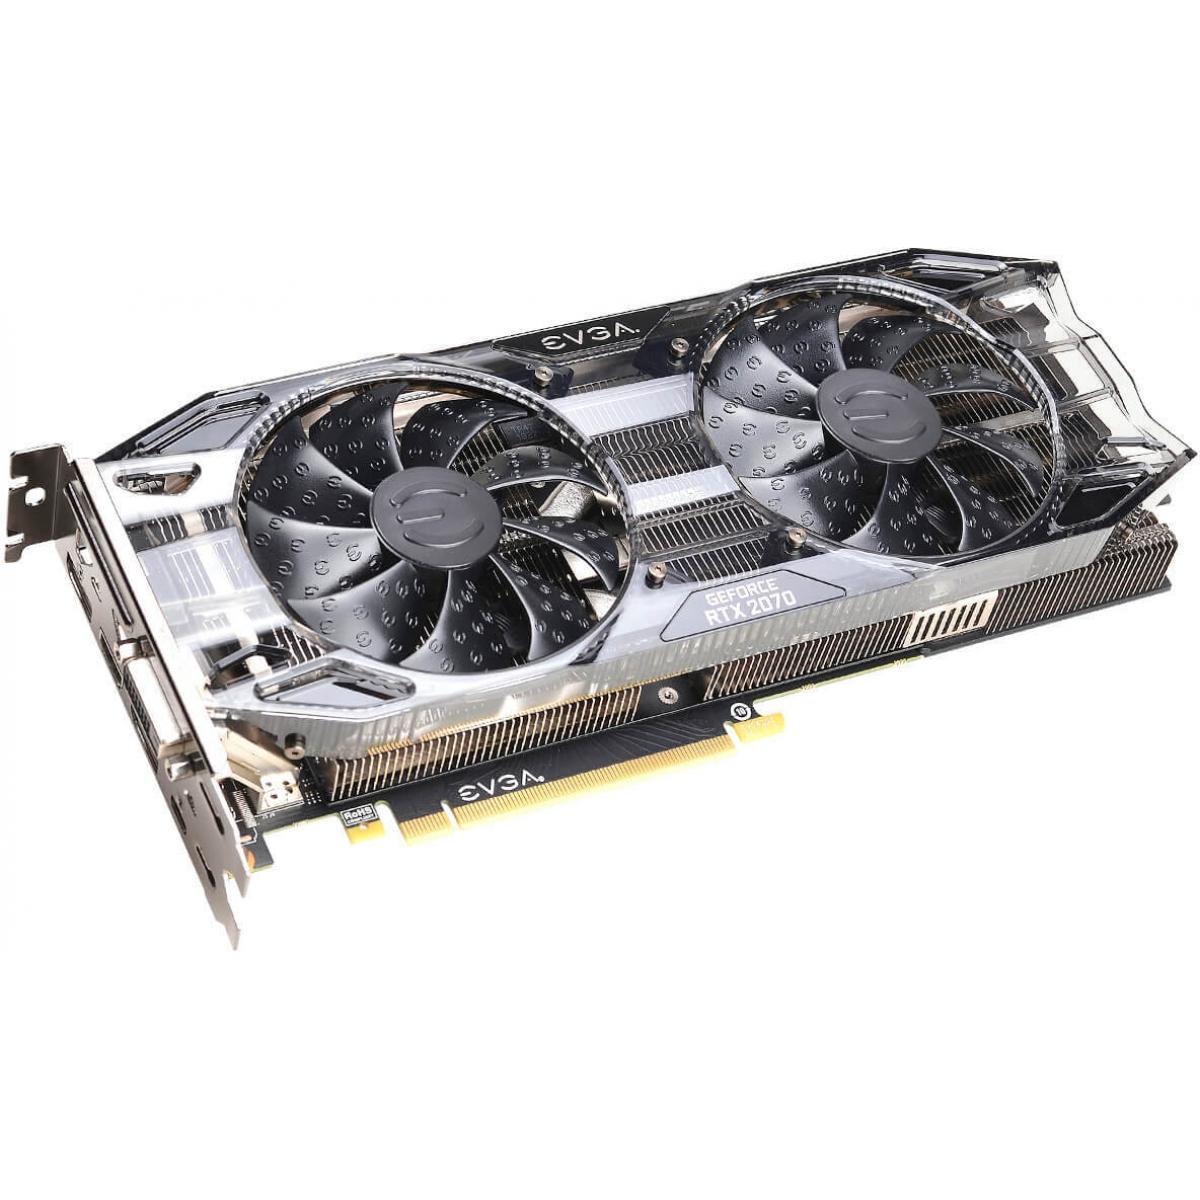 Placa de Vídeo EVGA Geforce RTX 2070 Black Gaming Dual, 8GB GDDR6, 256Bit, 08G-P4-1071-KR